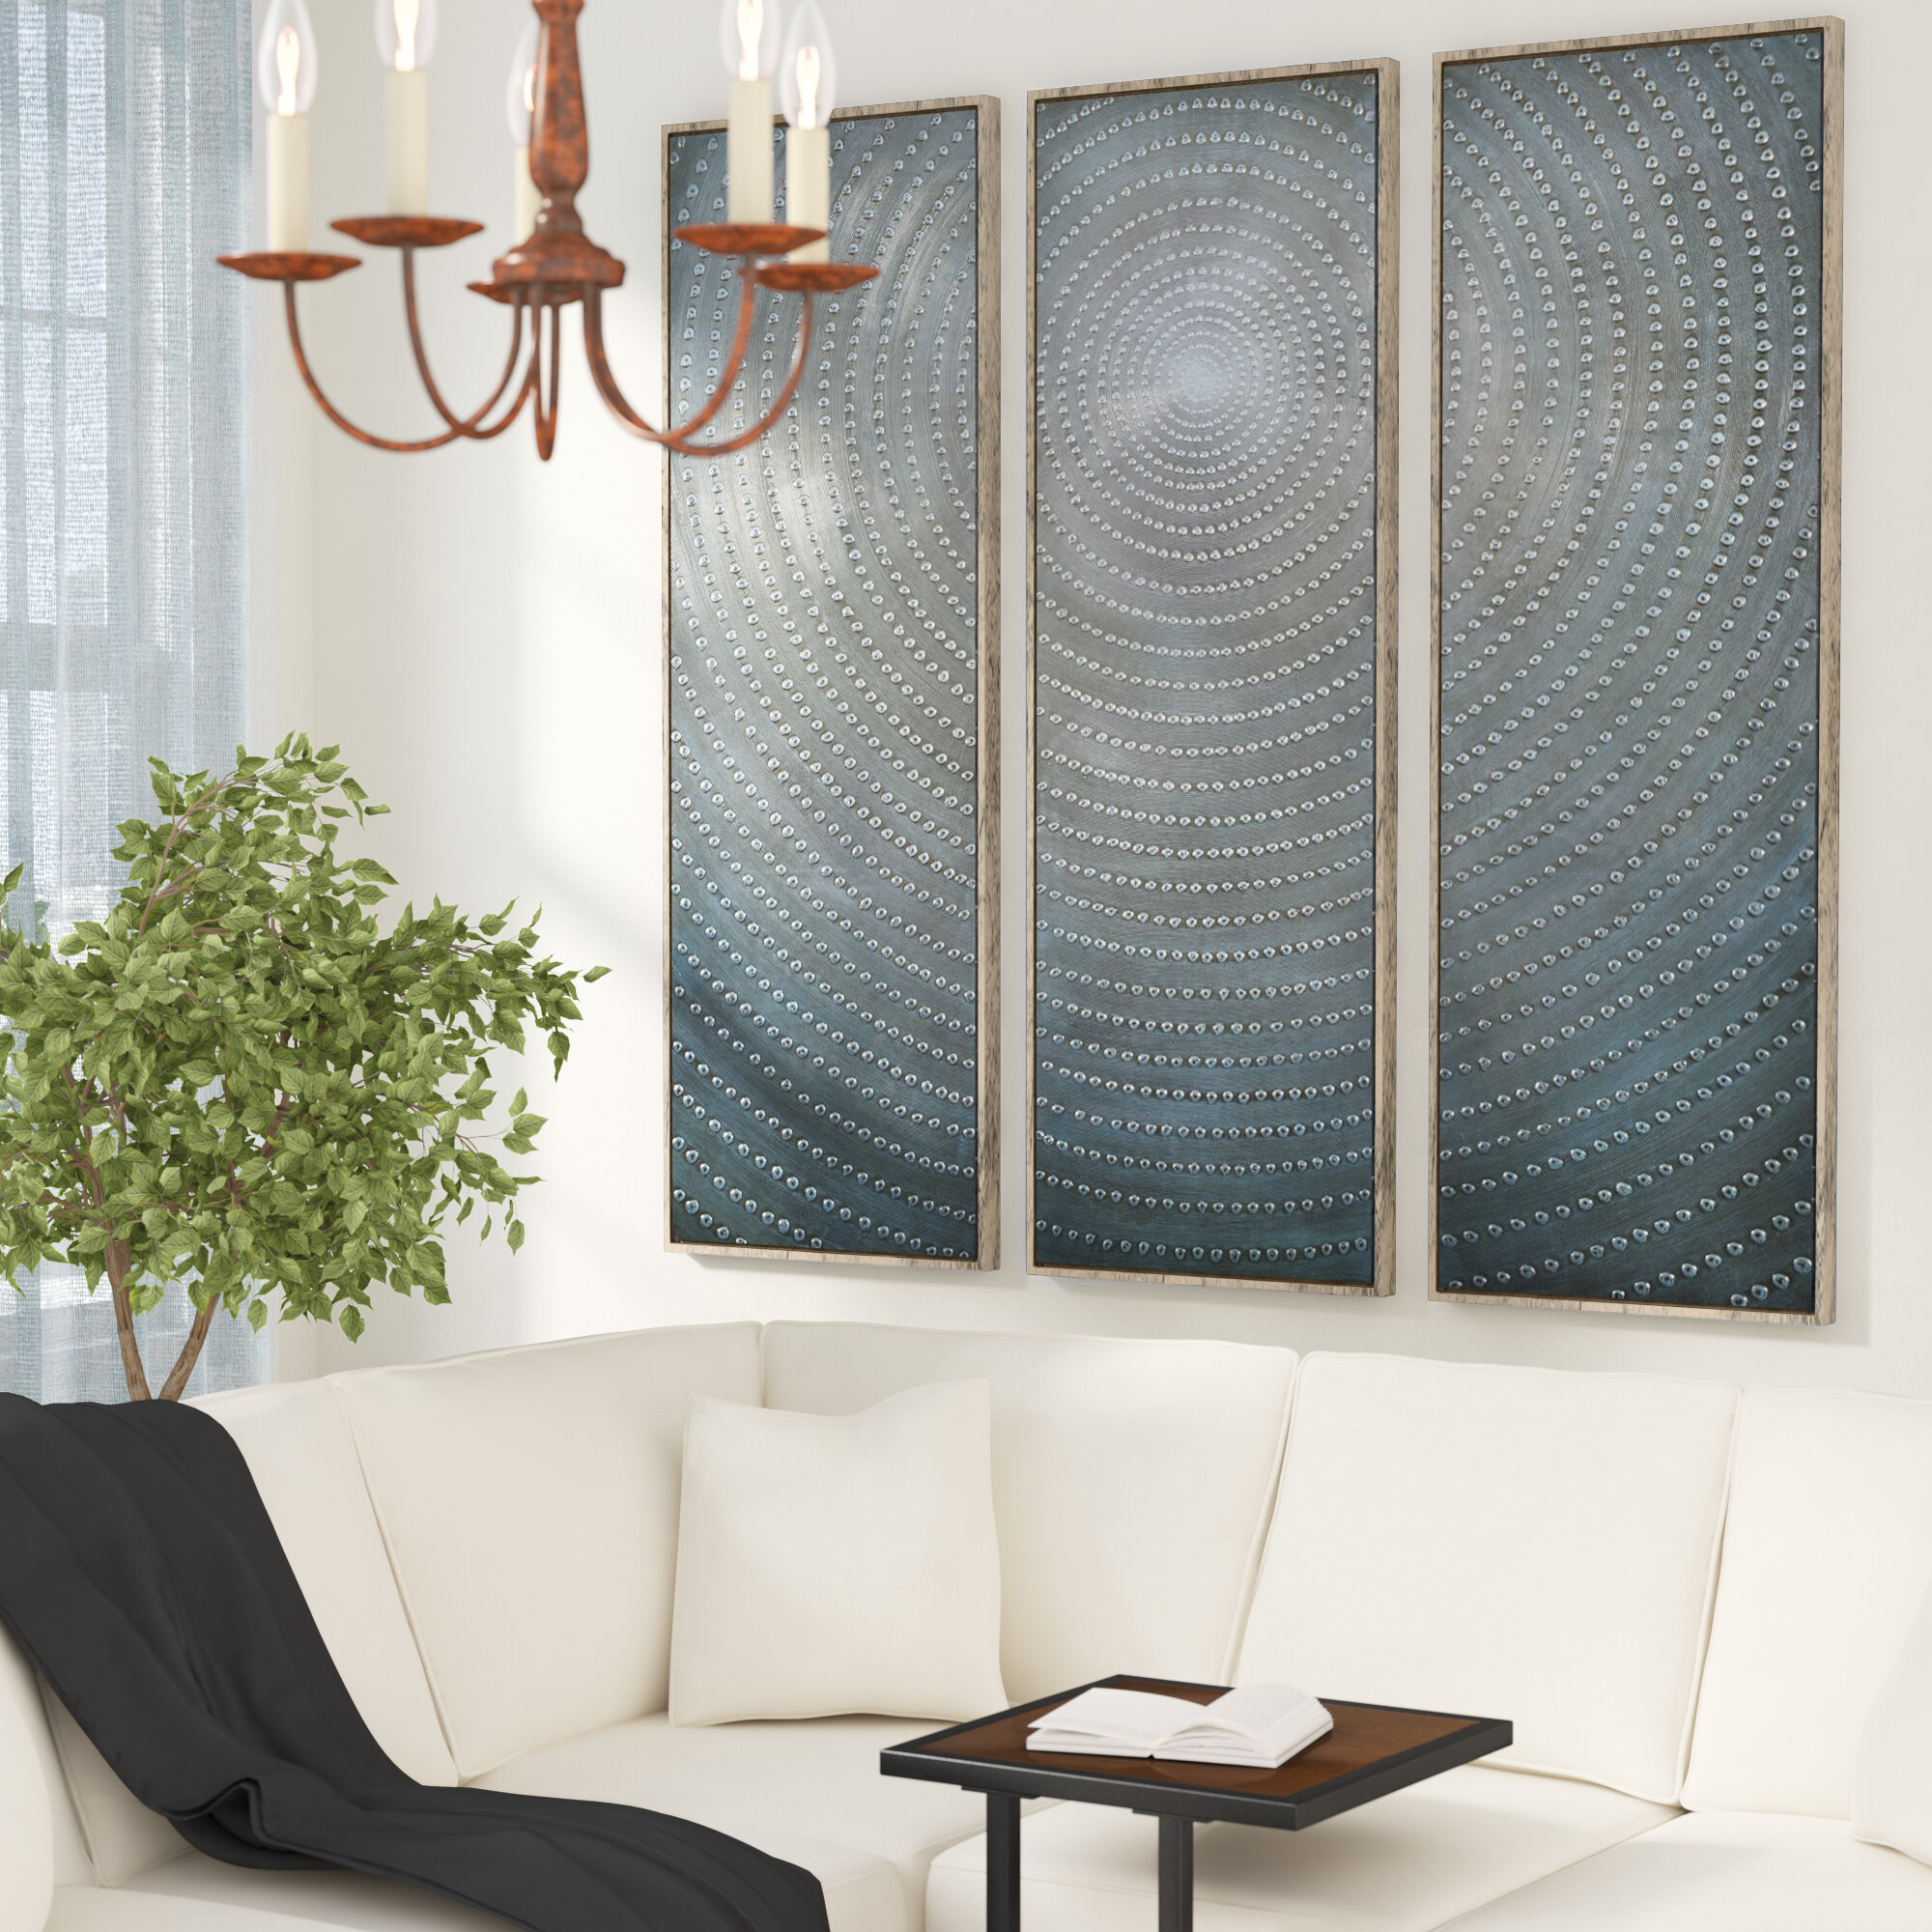 wall art decor for living room.htm wall art you ll love in 2020 wayfair  wall art you ll love in 2020 wayfair